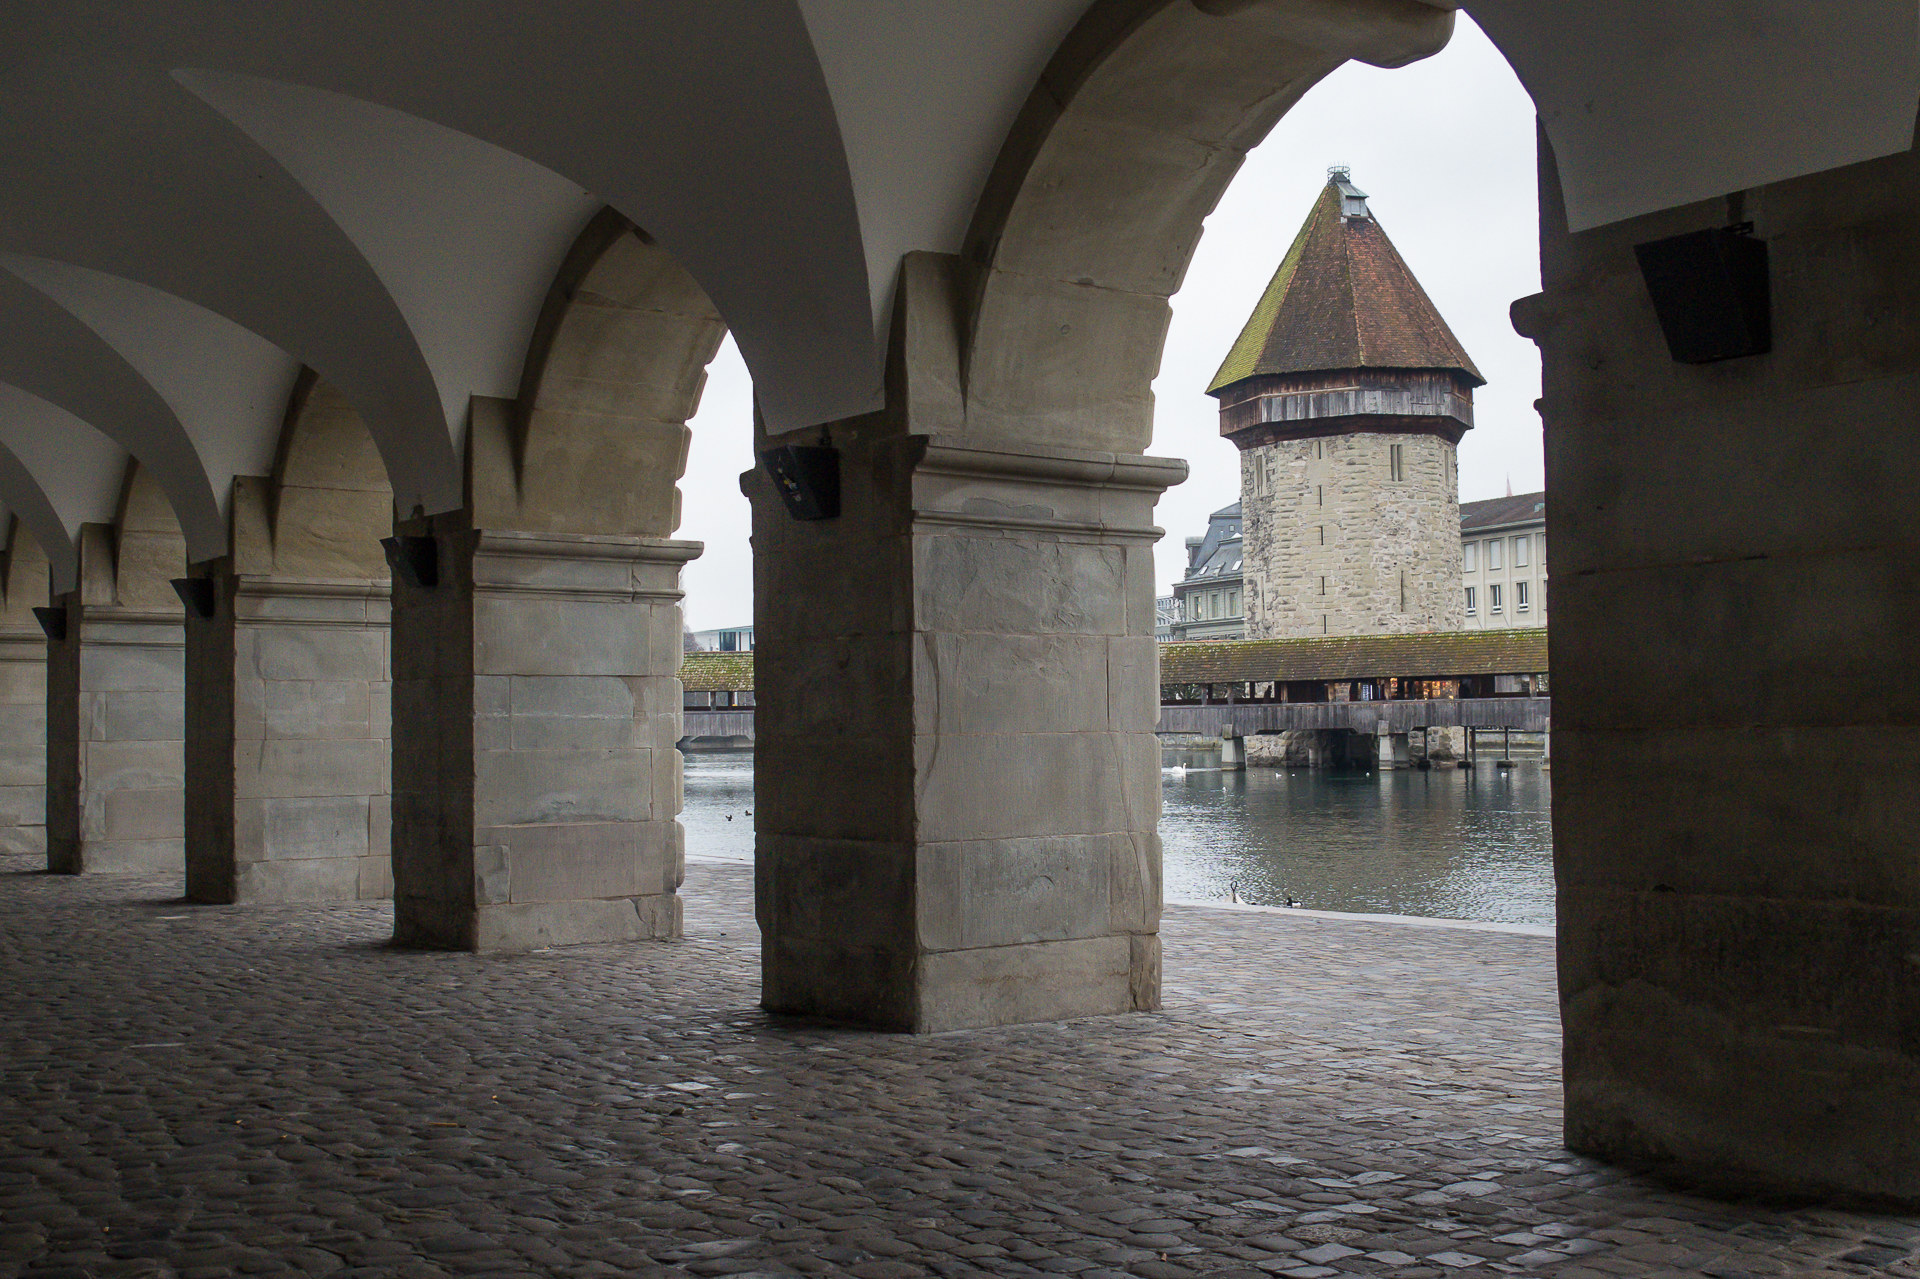 Elias Meier   Meine Politik   Kapellbrücke, Luzern